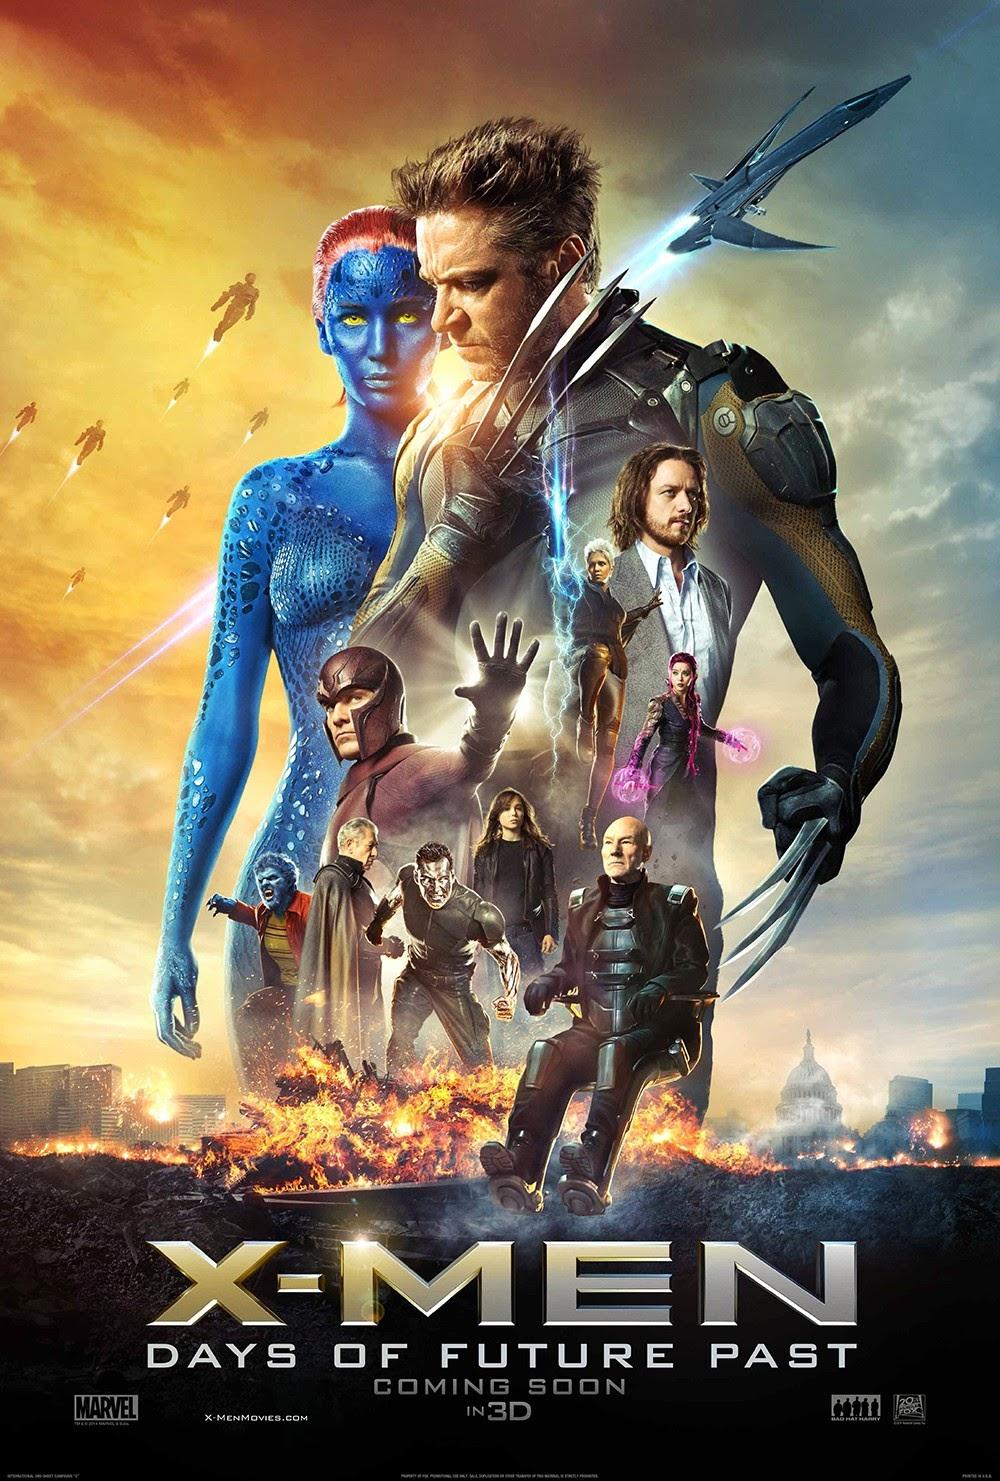 X-Men : Days of Future Past (2014) X-เม็น สงครามวันพิฆาตกู้อนาคต HD